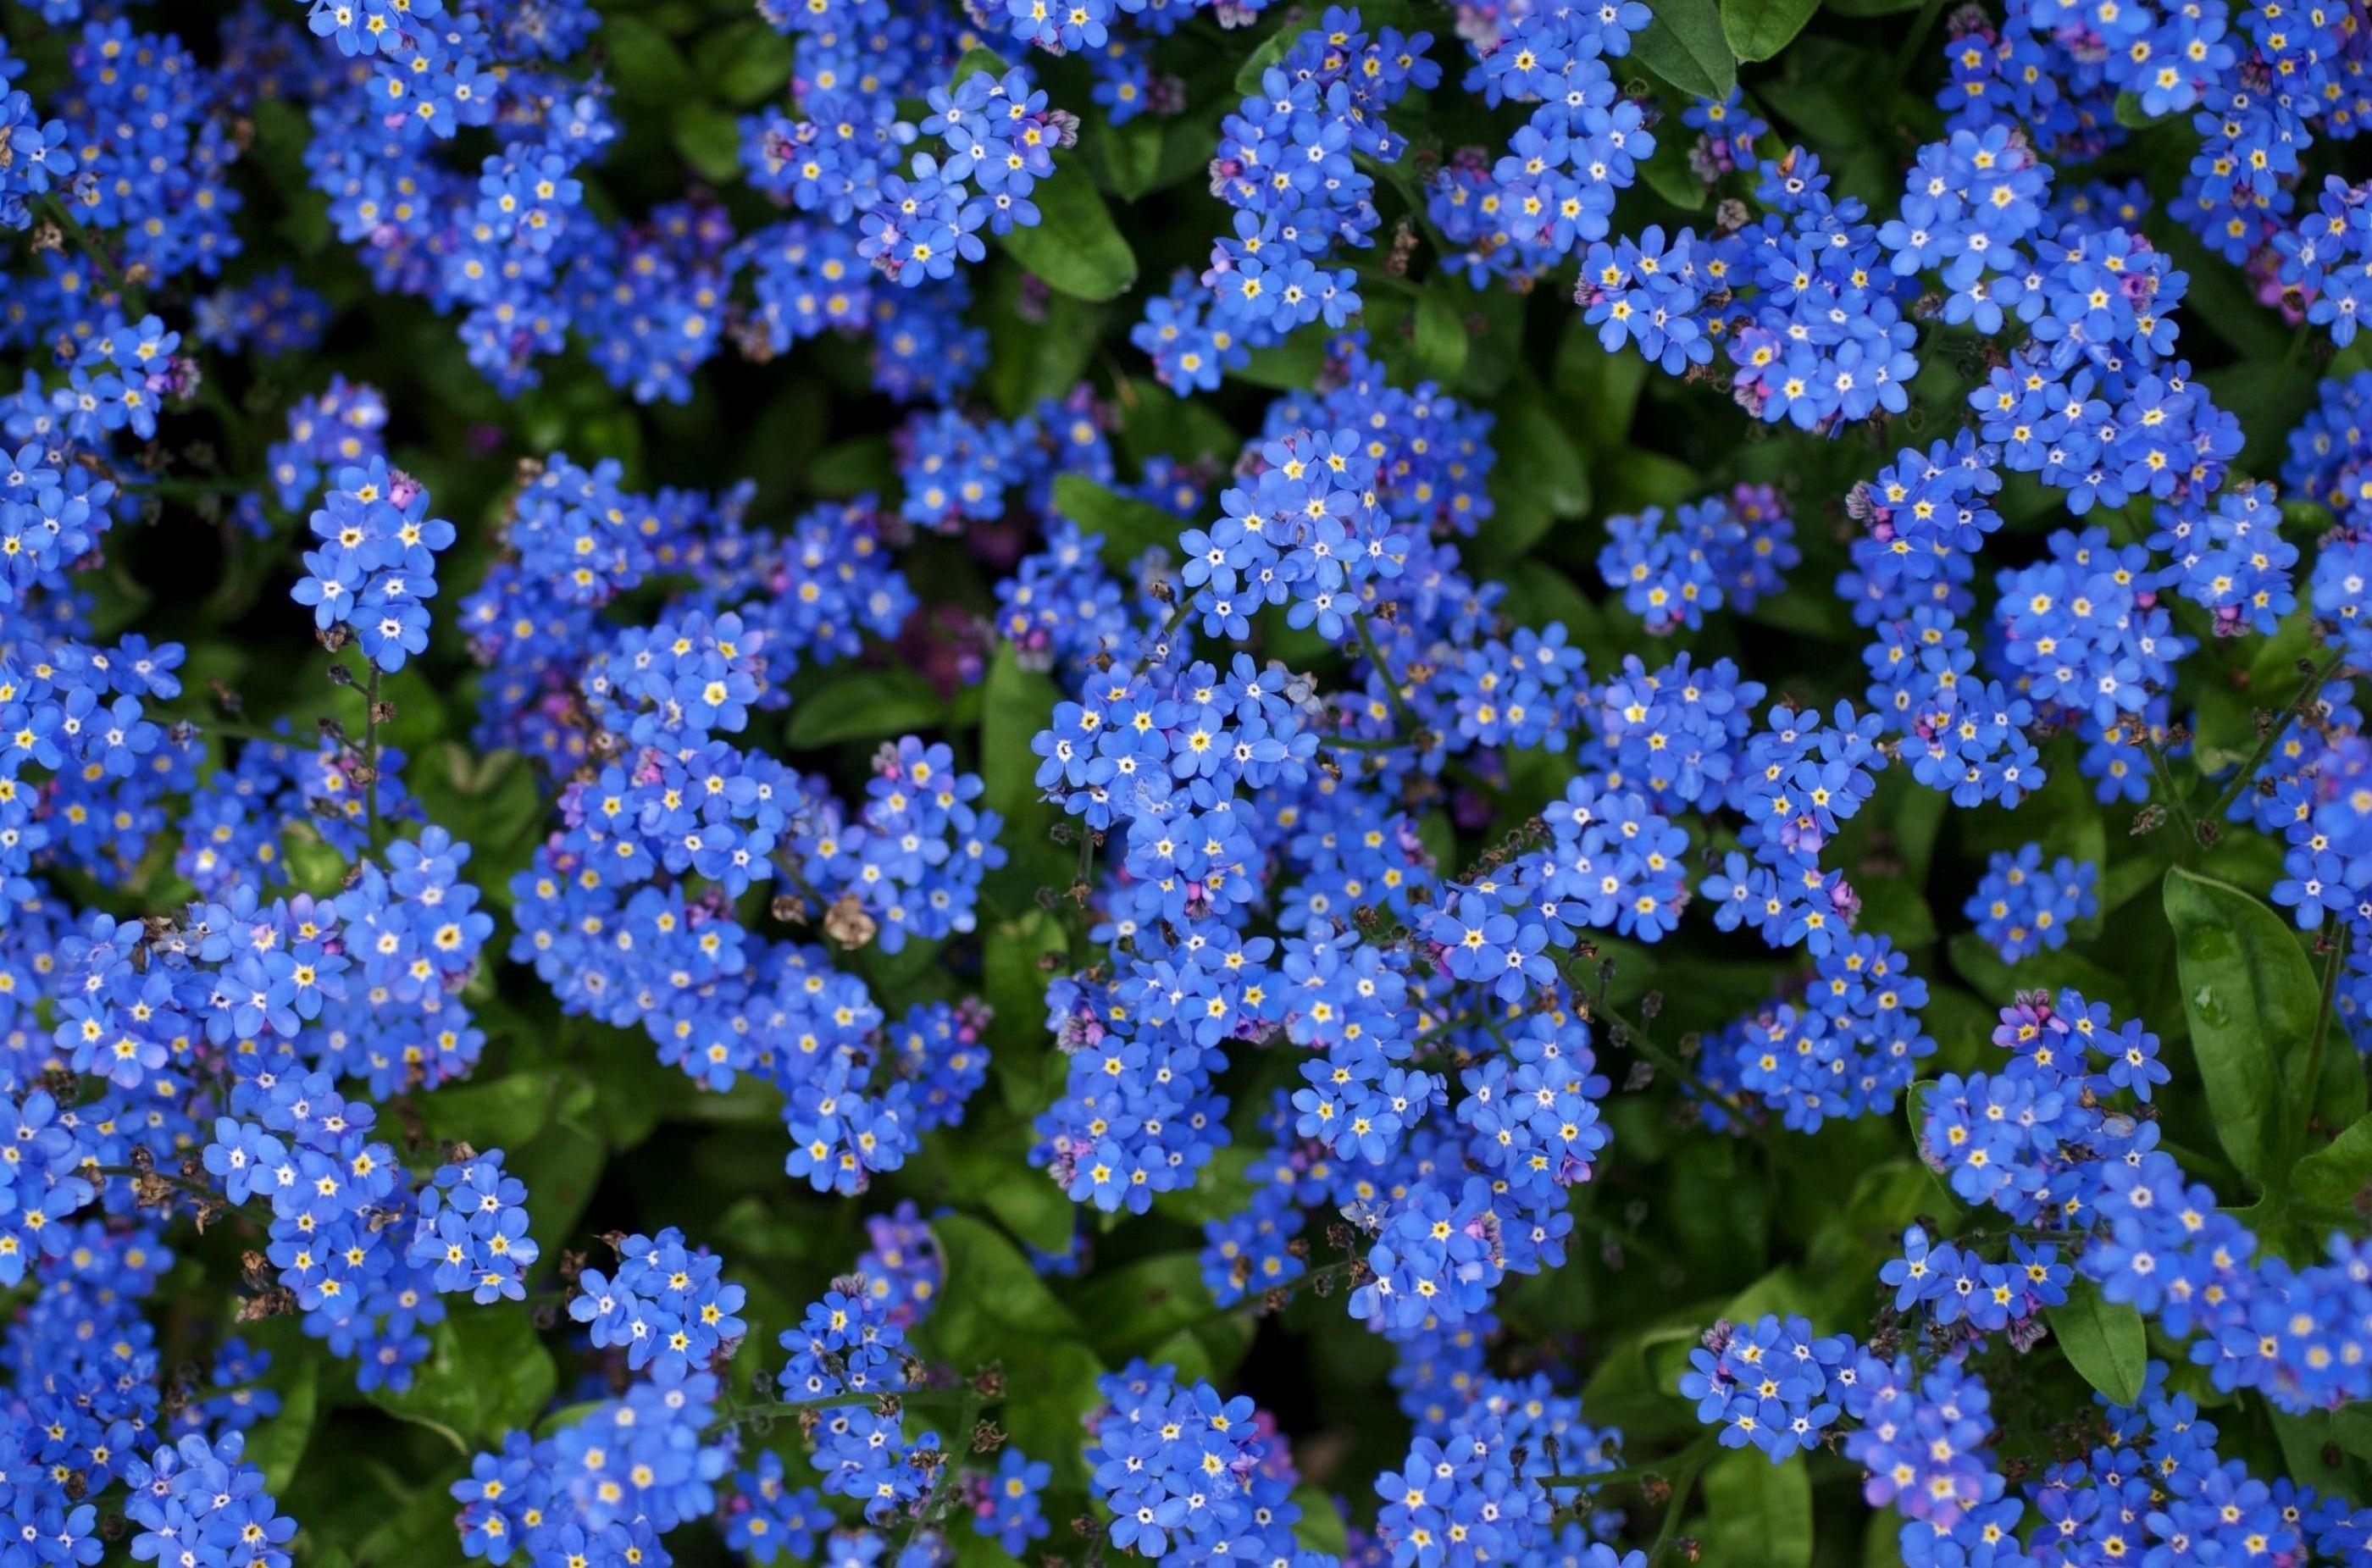 Bright blue flowers me nots flowers small blue bright my bright blue flowers me nots flowers small blue bright izmirmasajfo